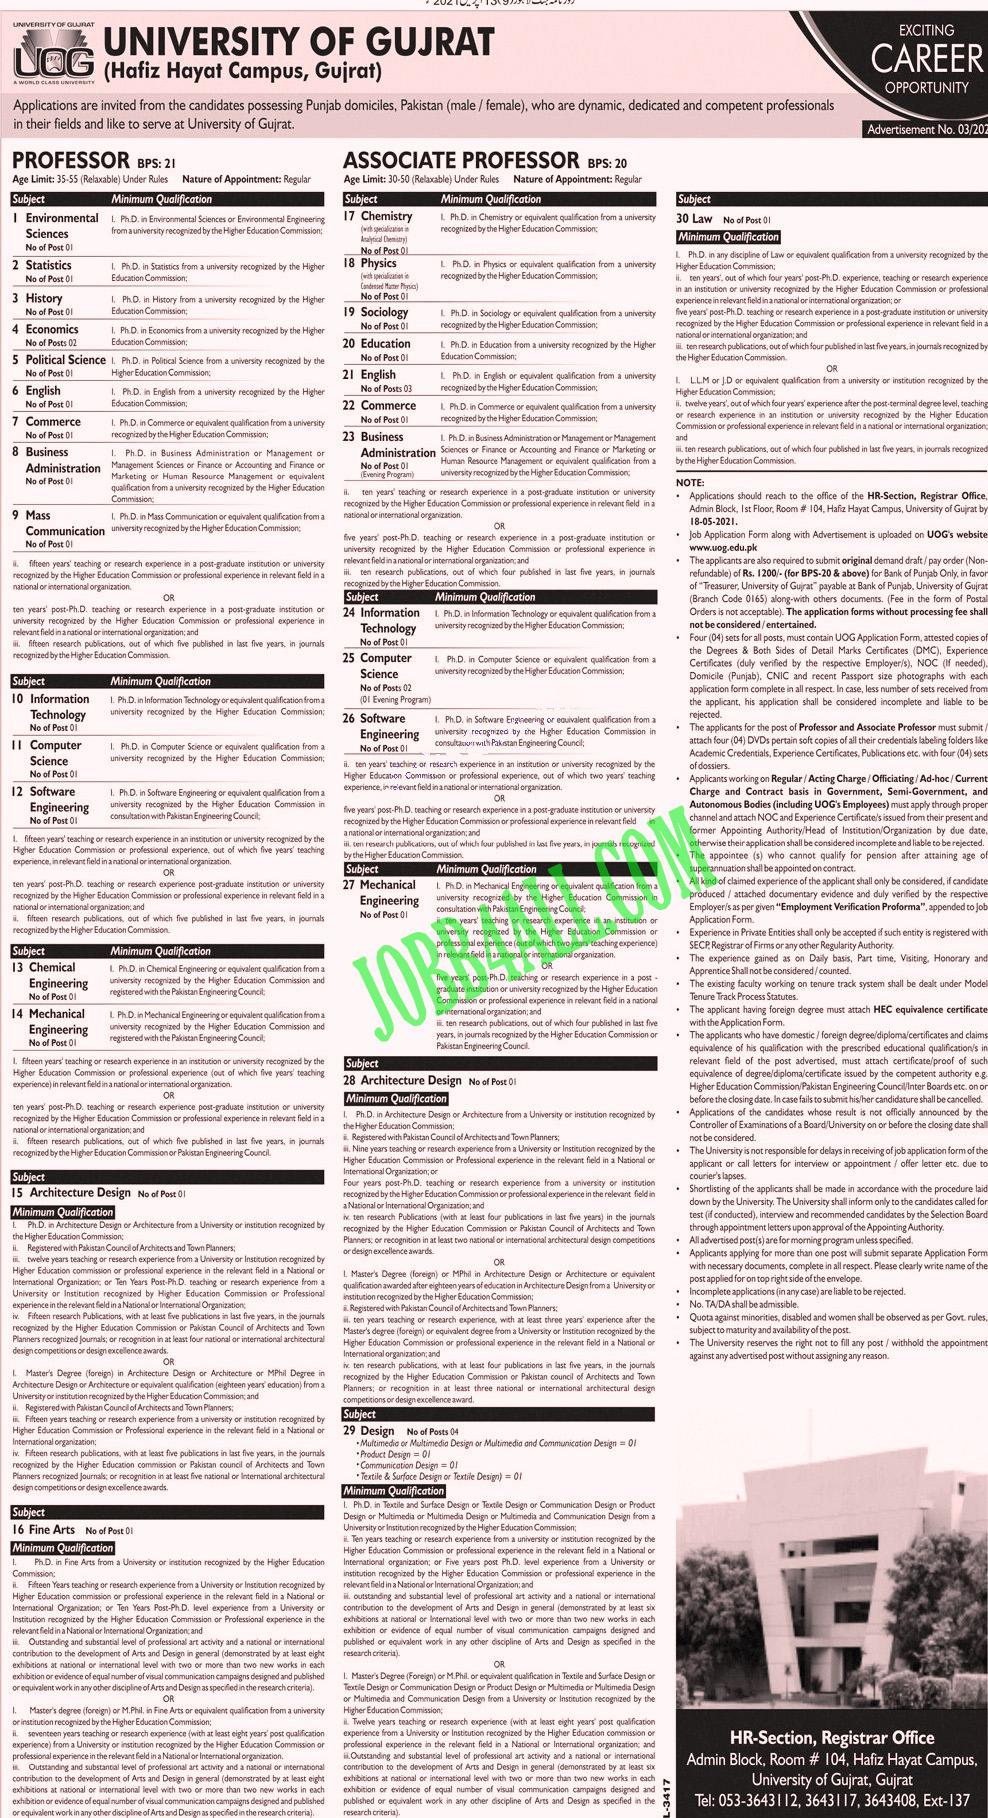 University Of Gujarat UOG April Jobs 2021 in Pakistan